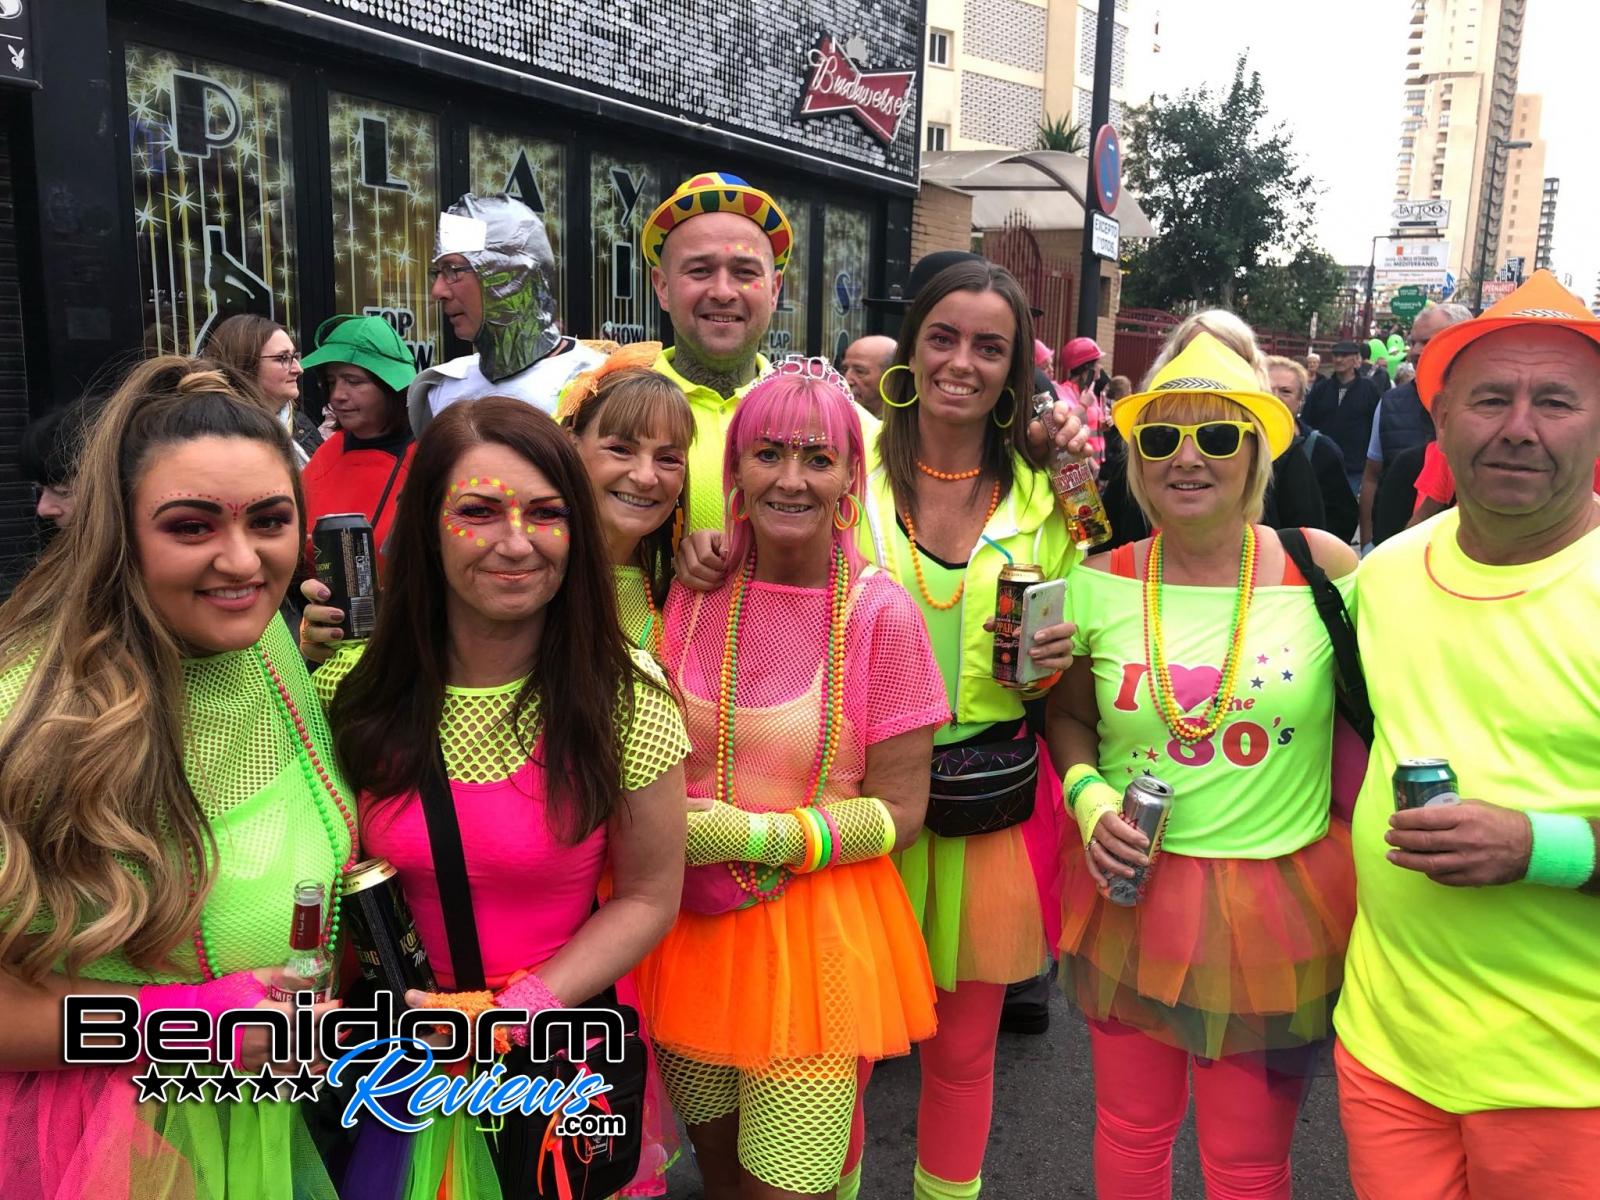 Benidorm-Fiestas-2019-Fancy-Dress-139